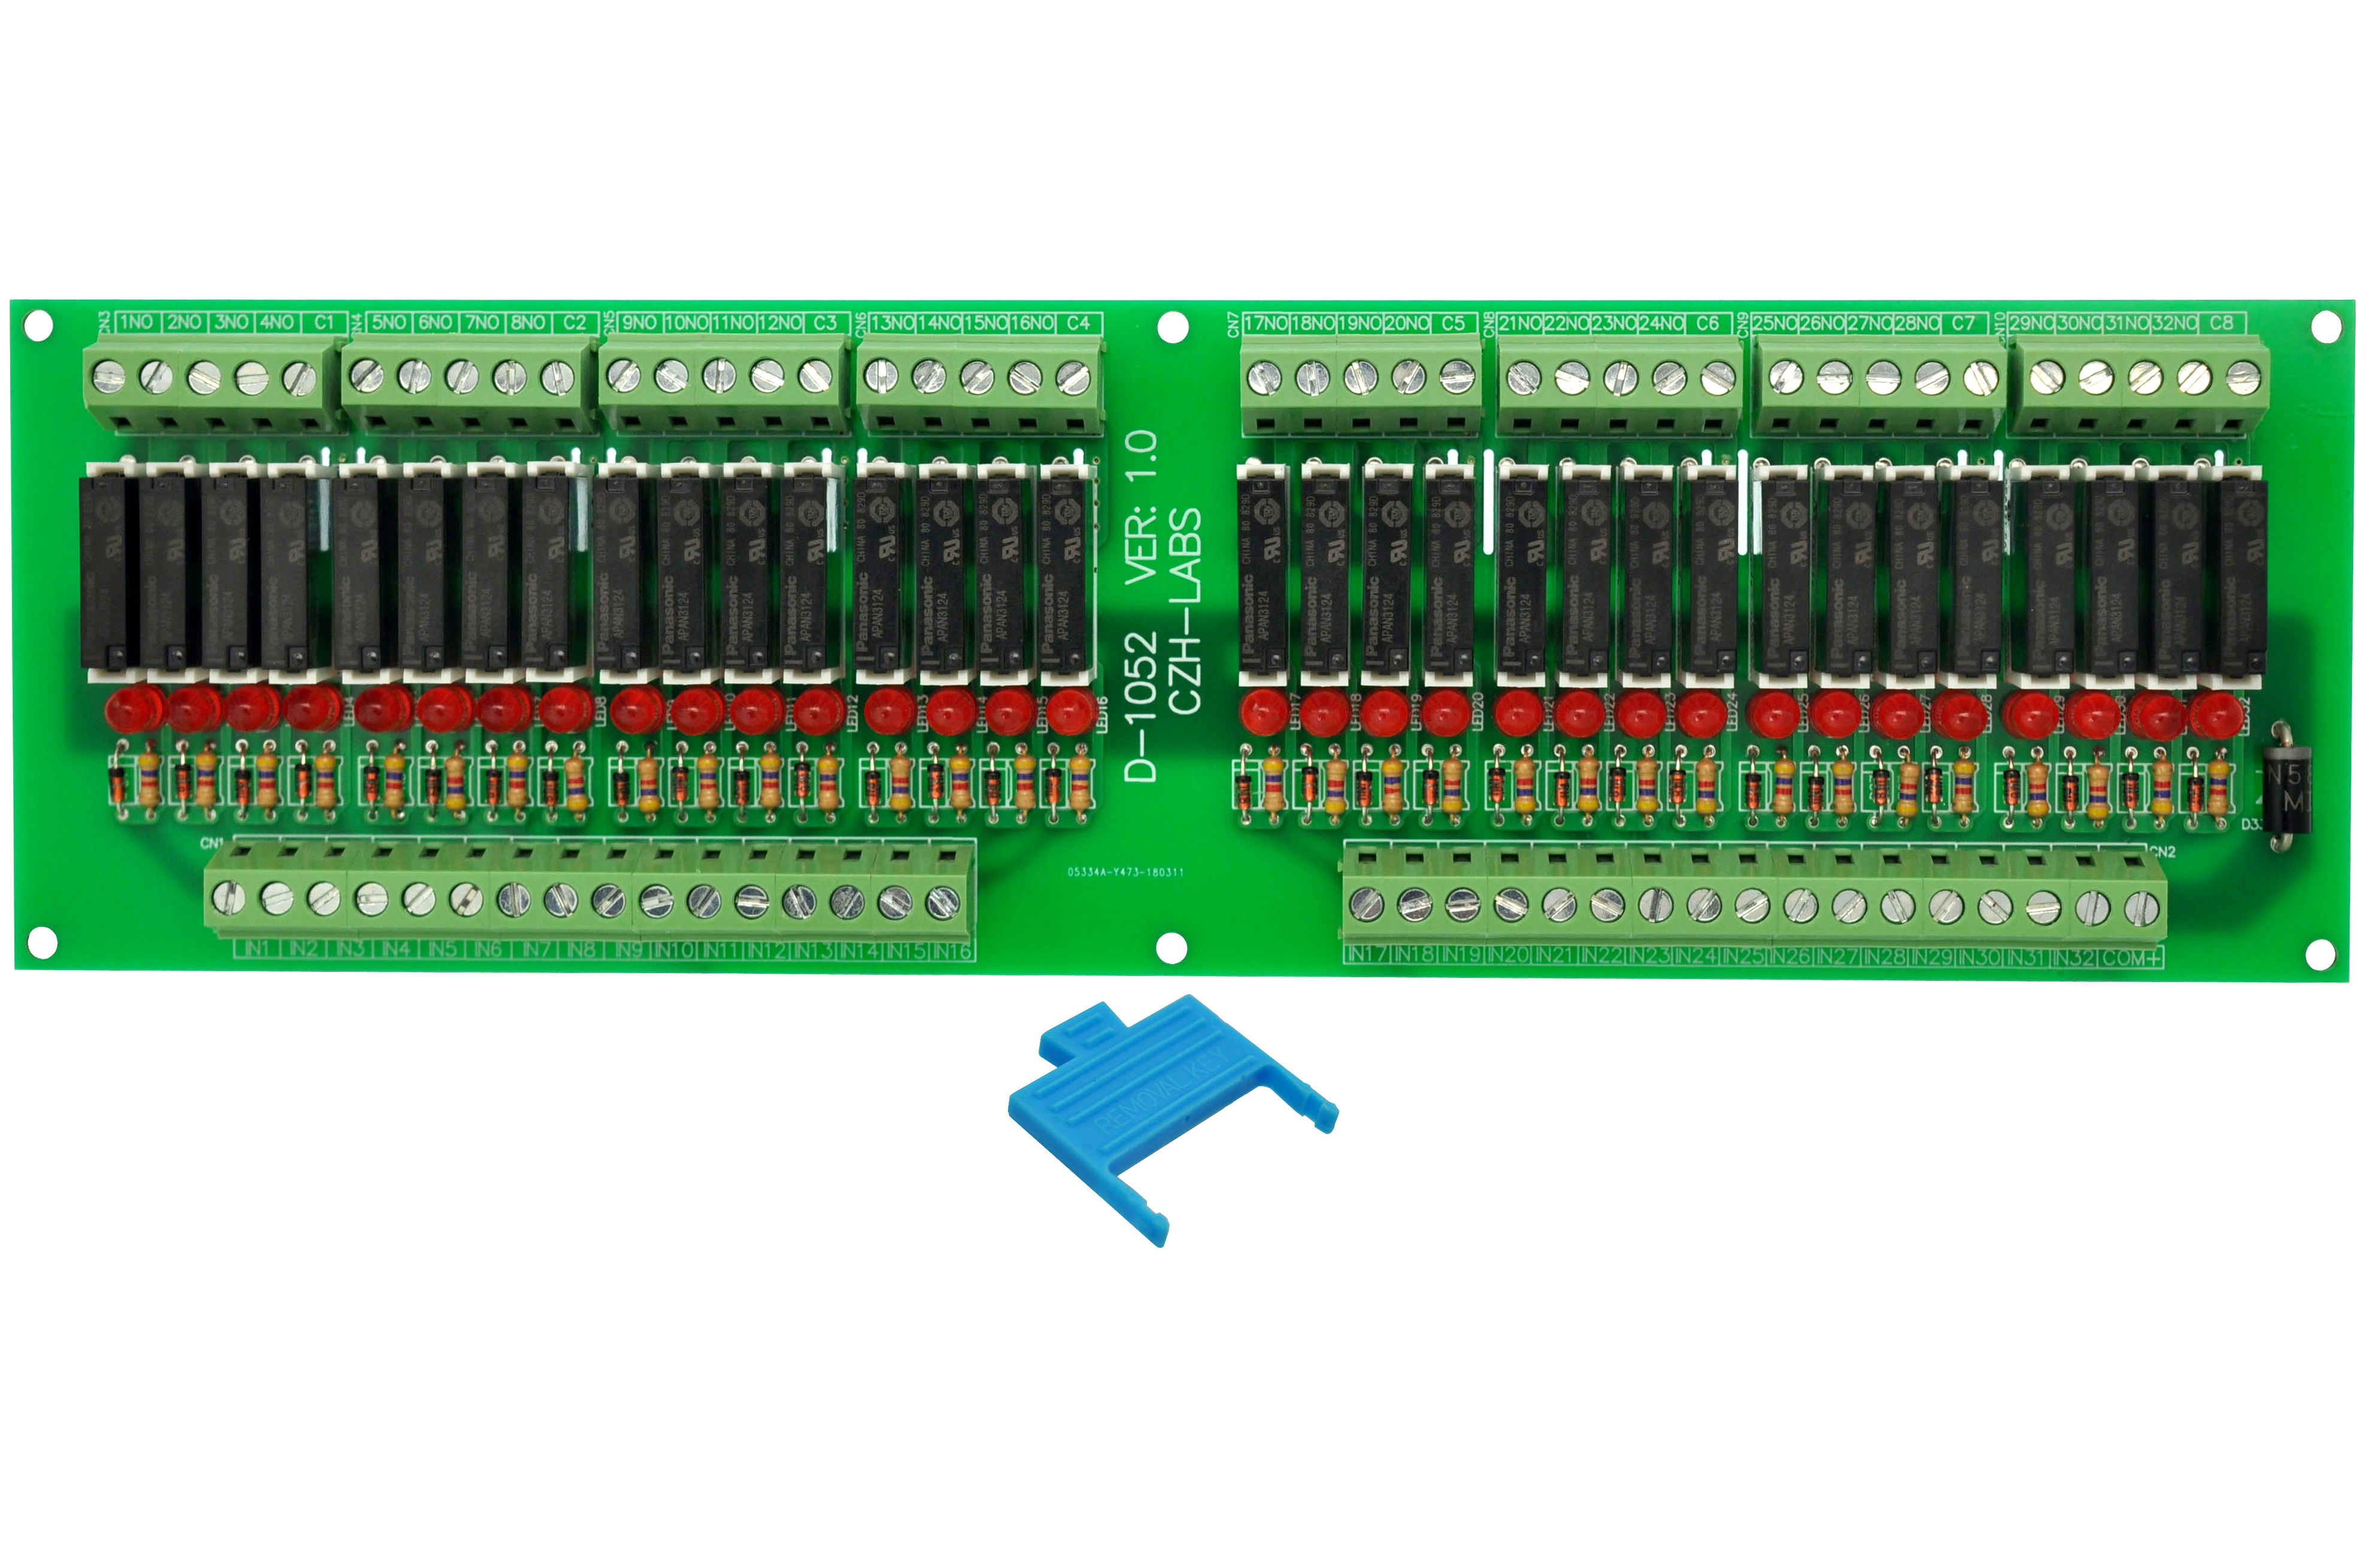 Slim Panel Mount DC24V Sink/NPN 32 SPST-NO 5A Power Relay Module, APAN3124